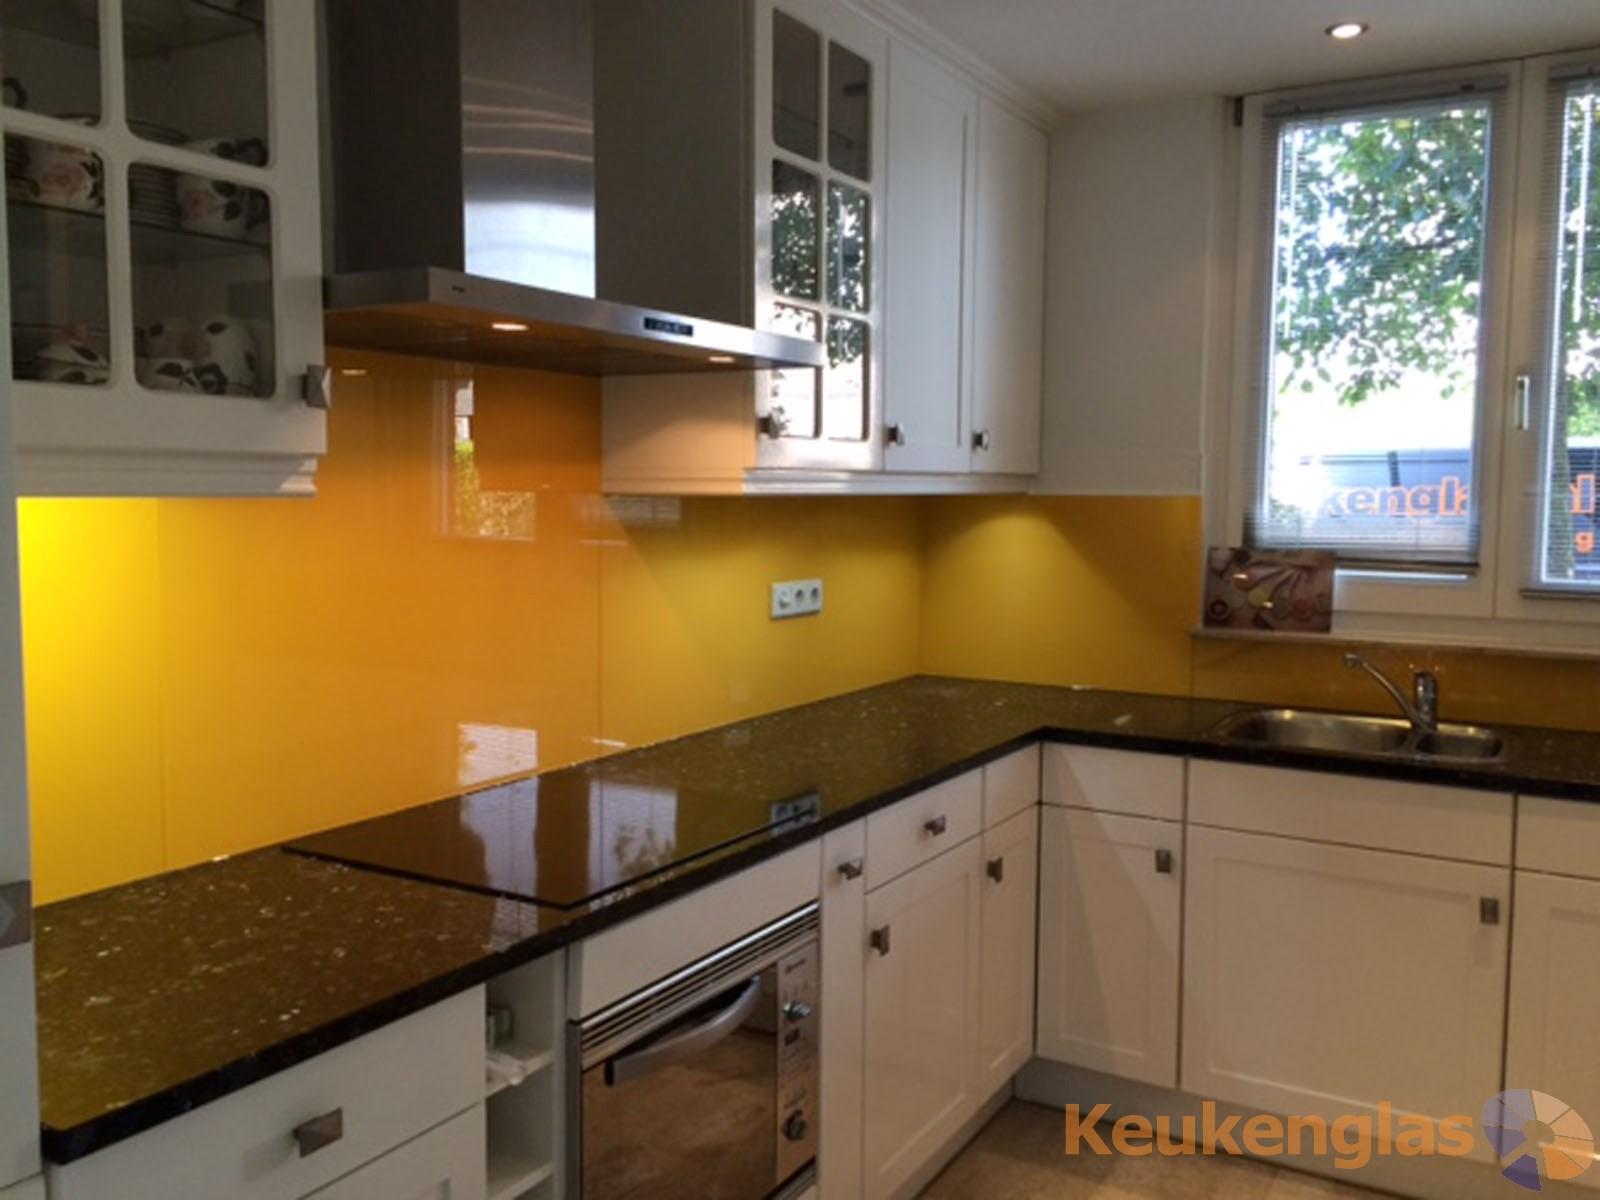 Gele keuken glaswand in helmond   keukenglas